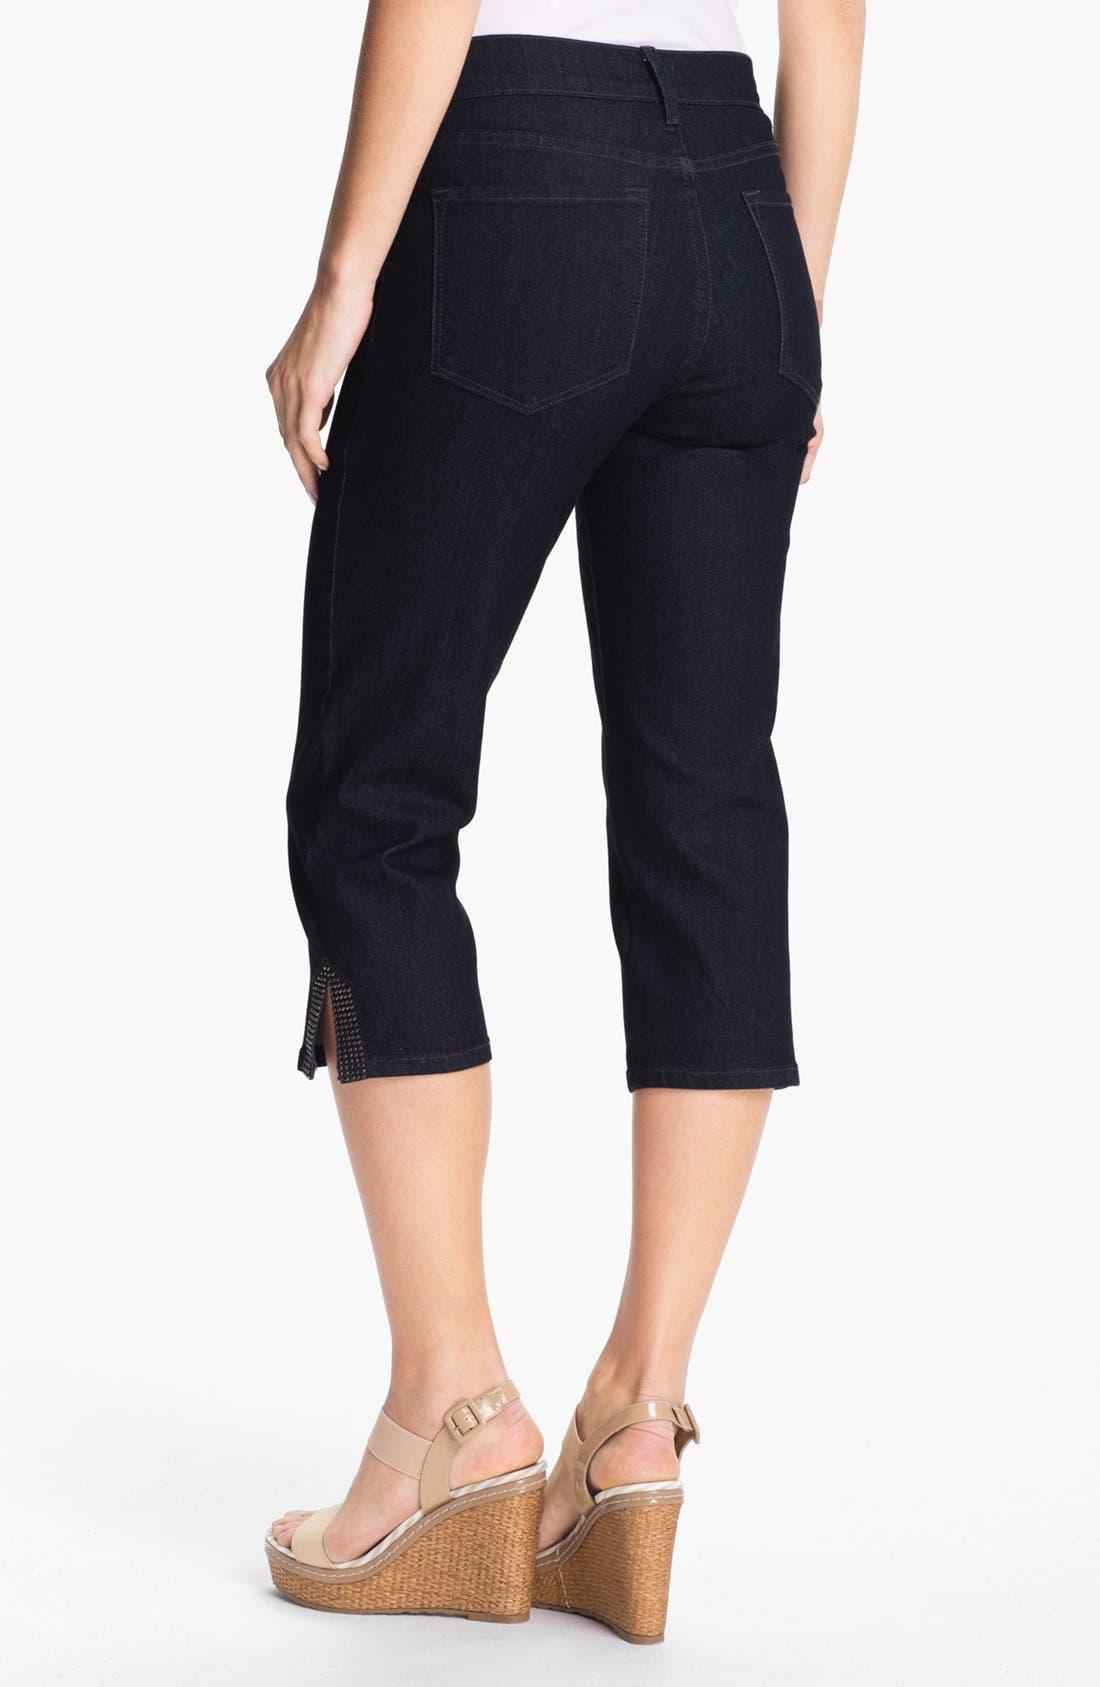 Alternate Image 2  - NYDJ 'Suzy' Embellished Crop Jeans (Plus Size)